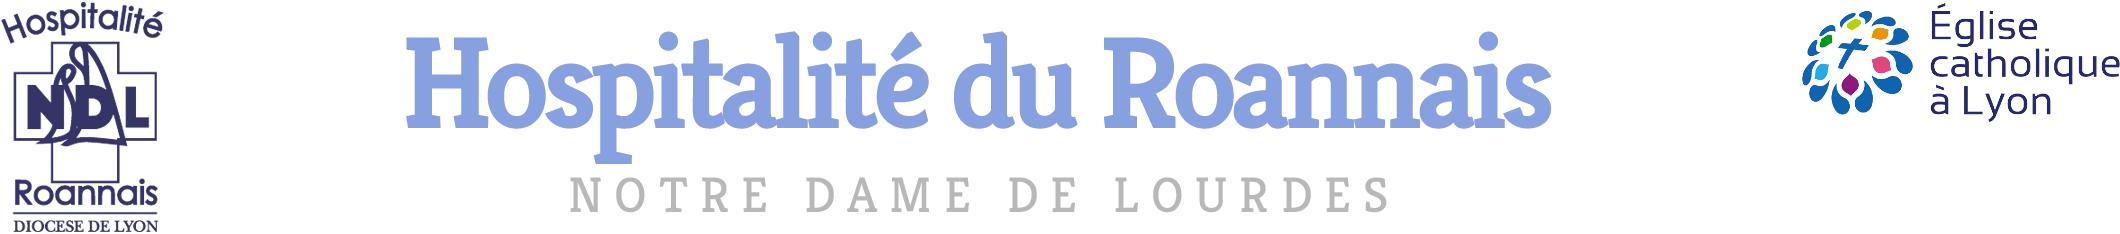 Logo Hospitalité du Roannais